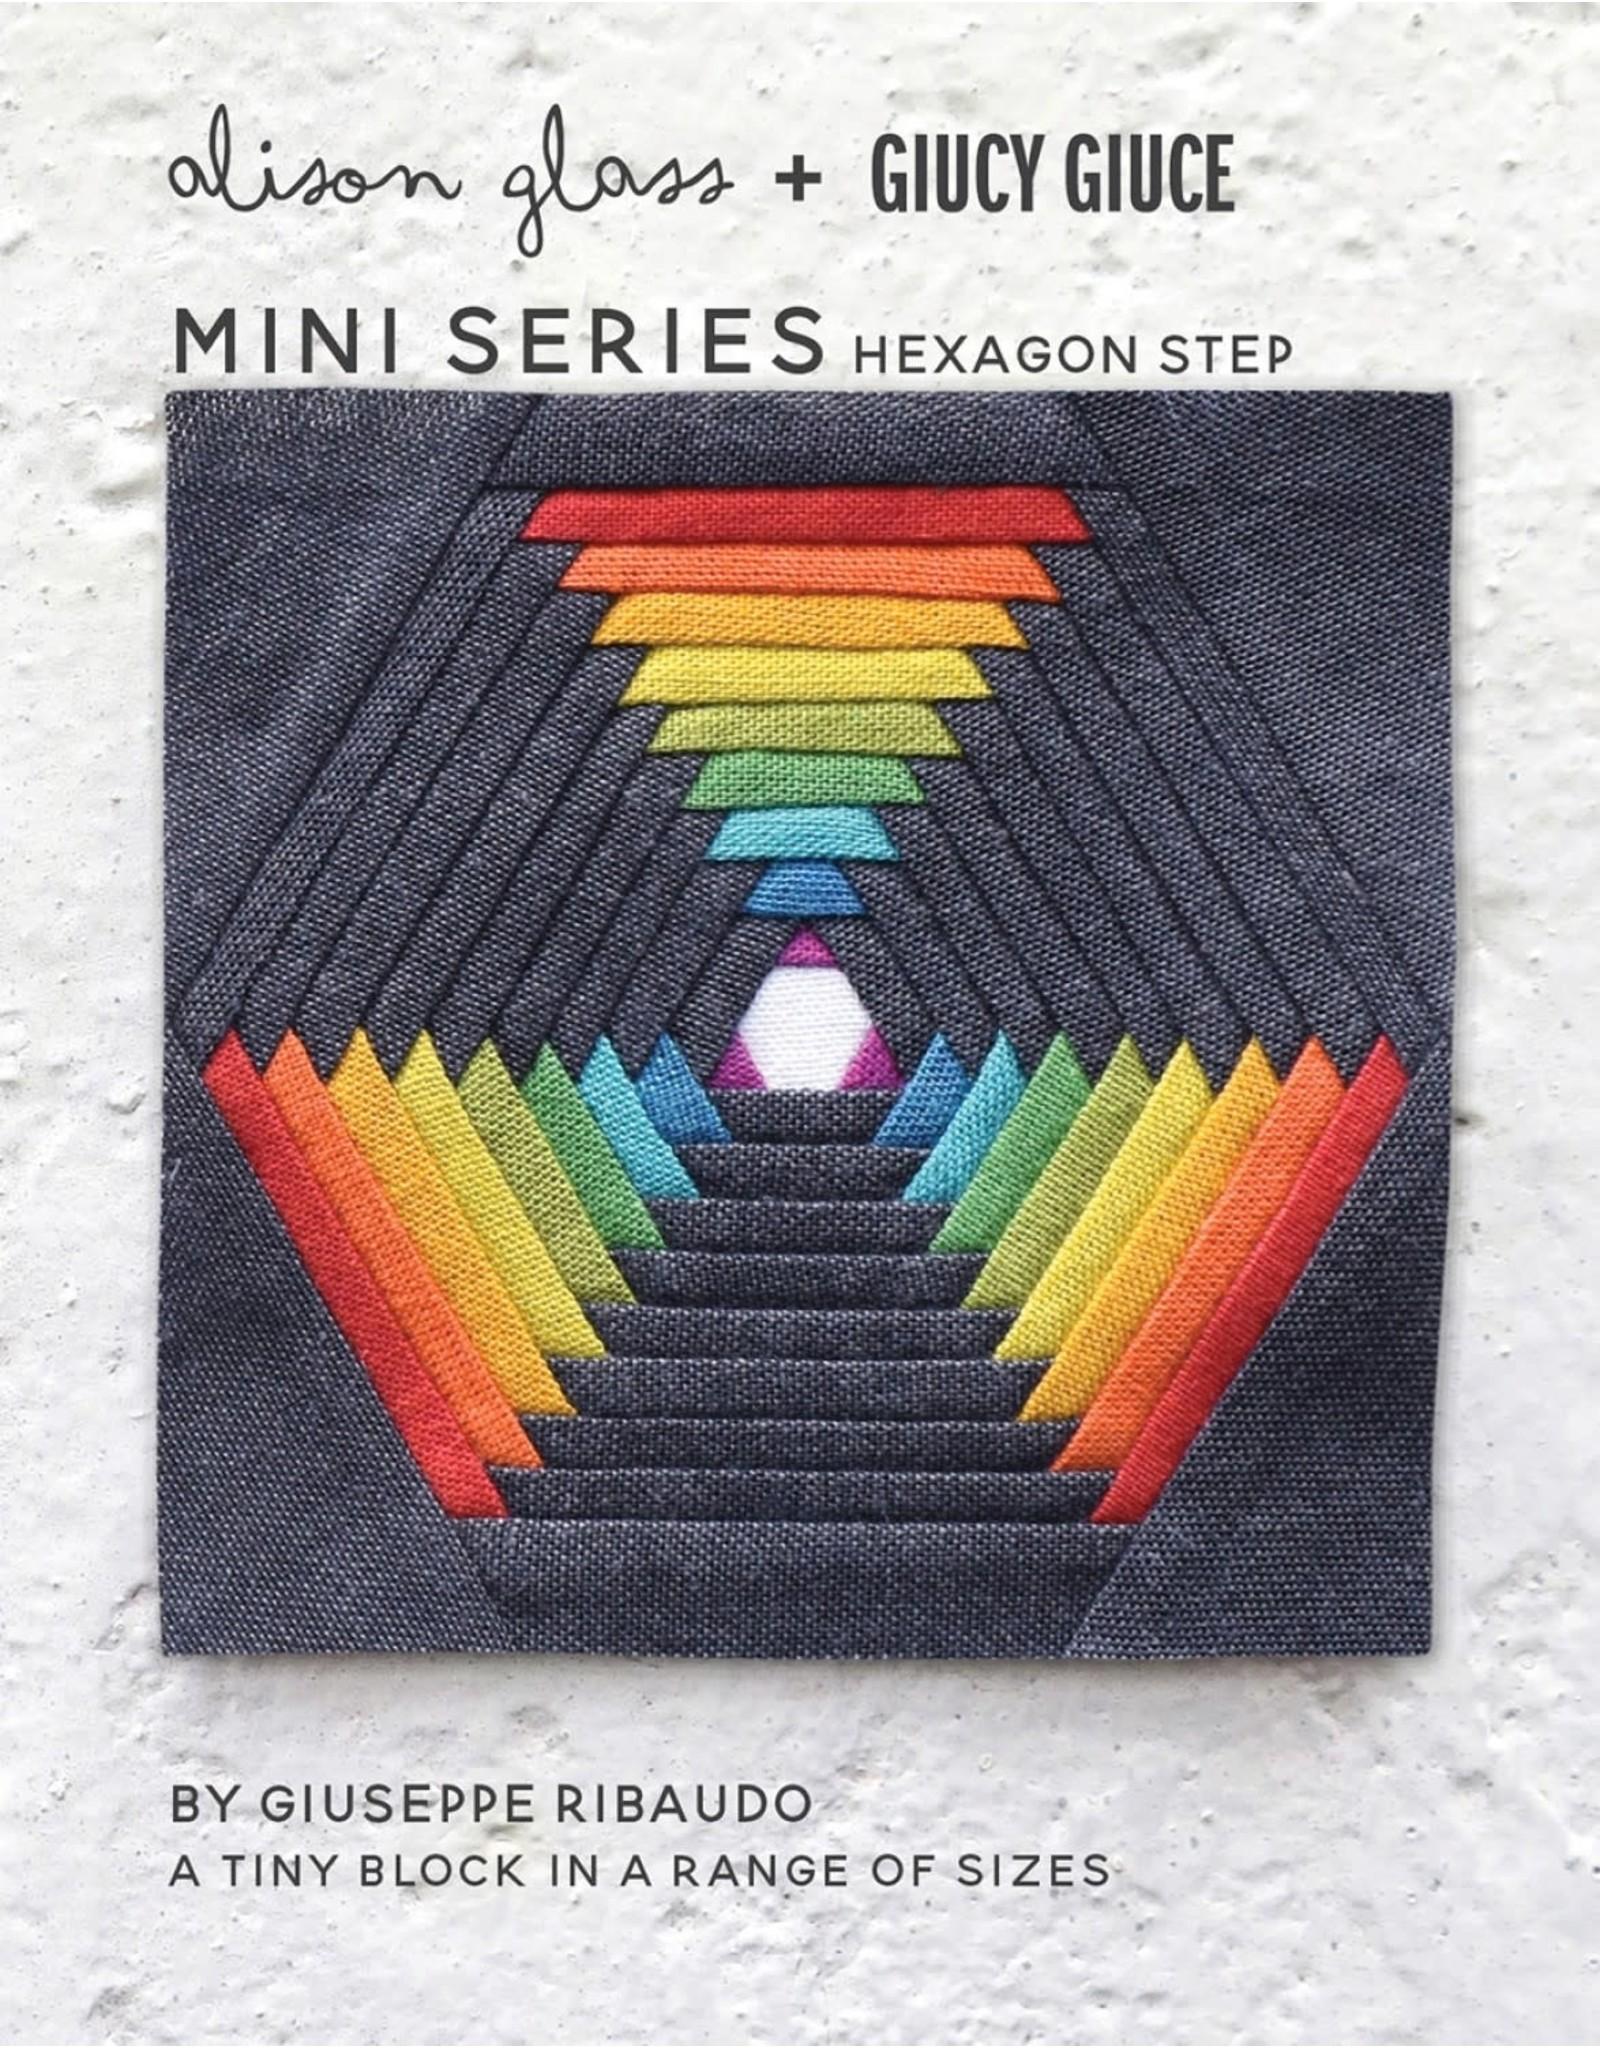 Mini Series - Hexagon Step